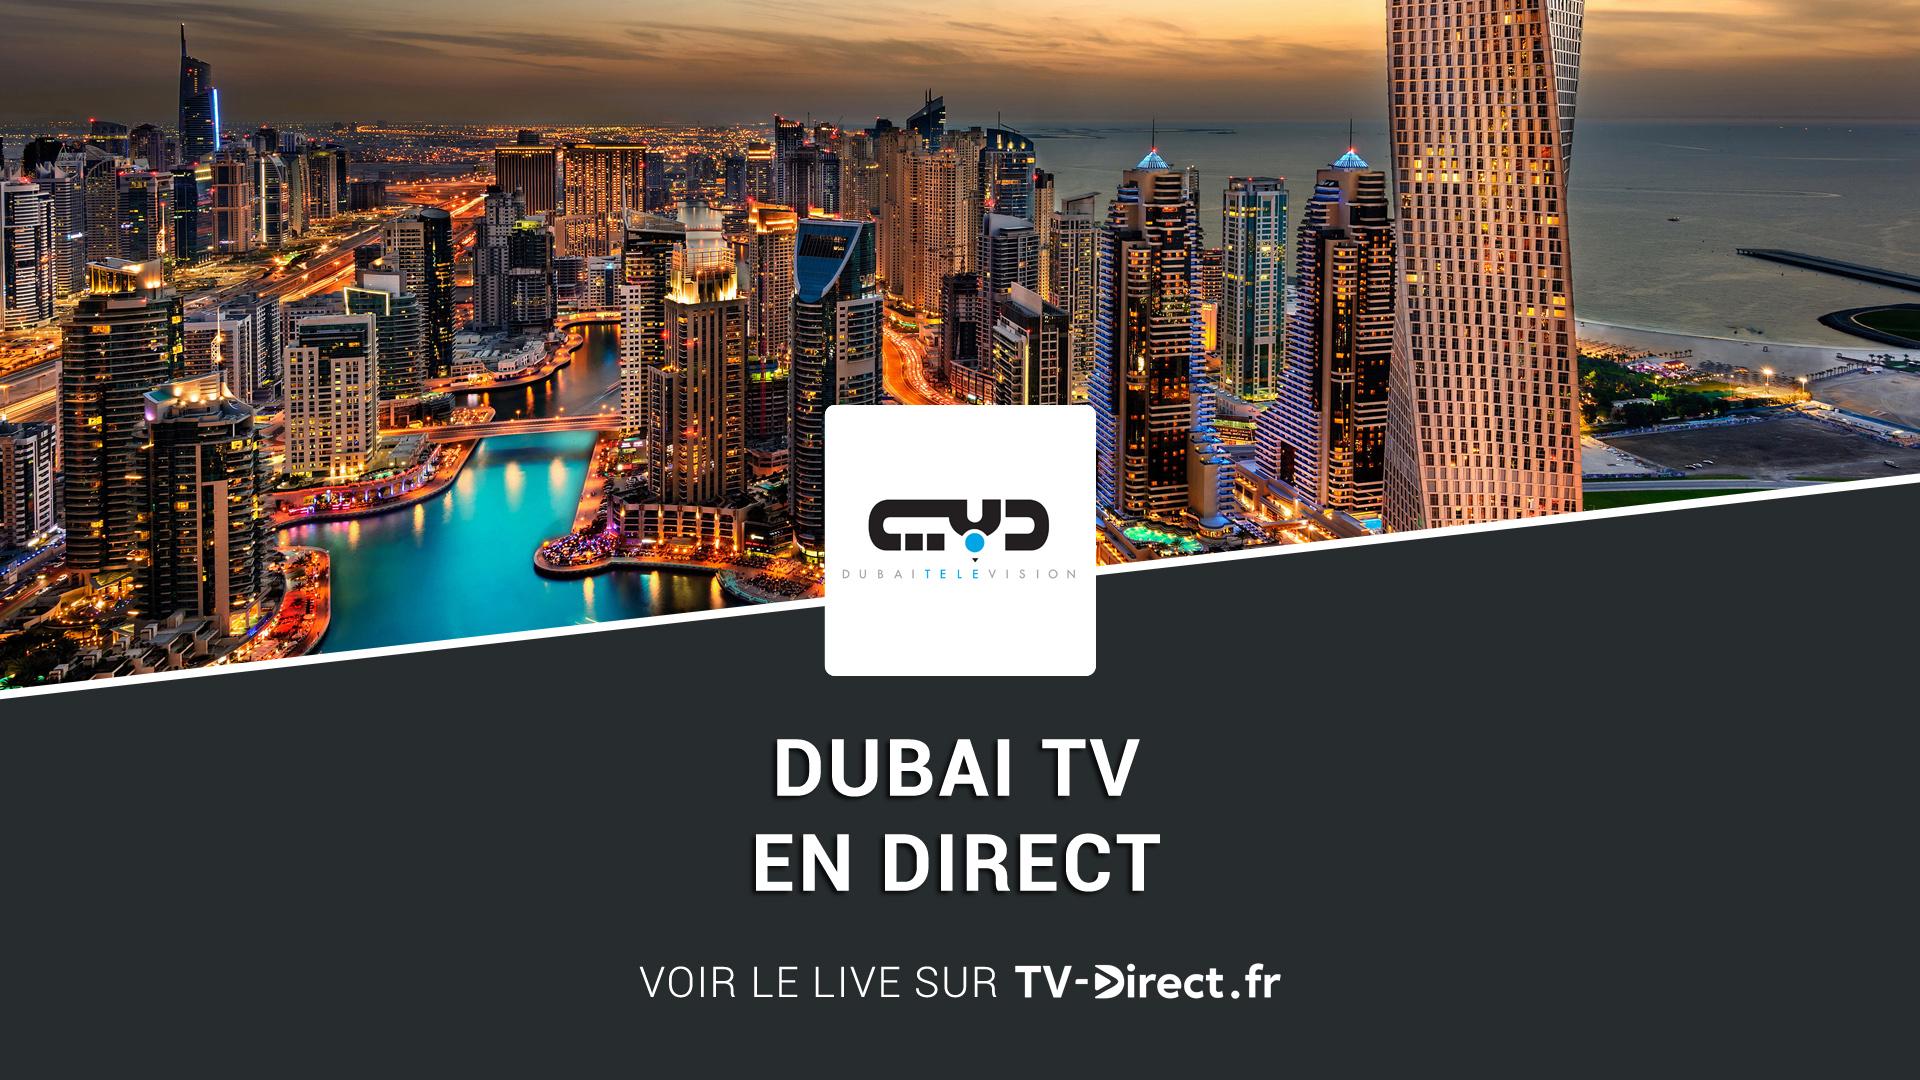 internet sur bbox tv - https://www.tv-direct.fr/assets/social/live/dubai-tv.jpg